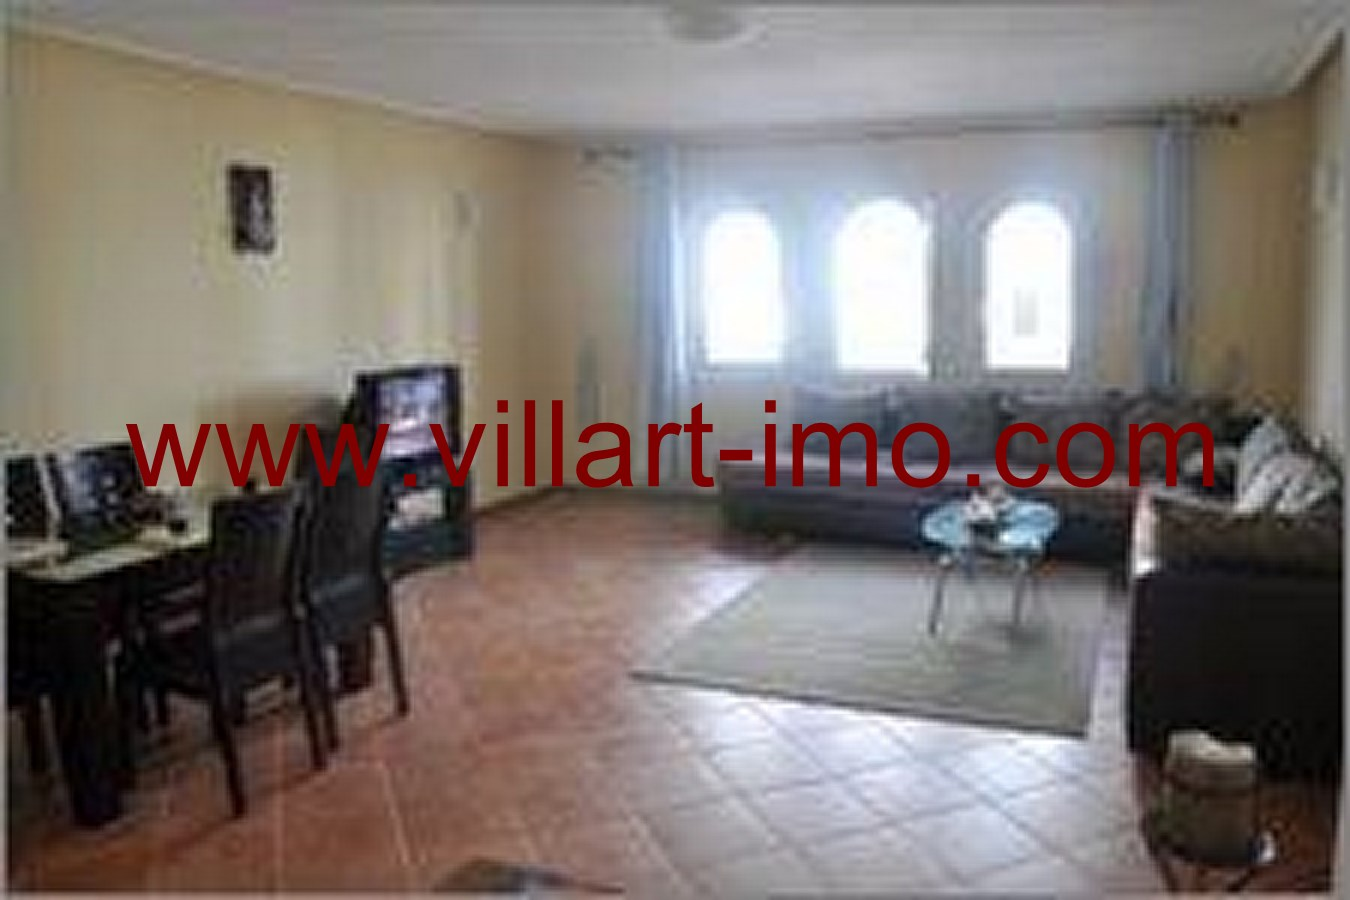 4- Vente -Appartement-Tanger-Maroc–Malabata- Salon-VA50-Villartimmo